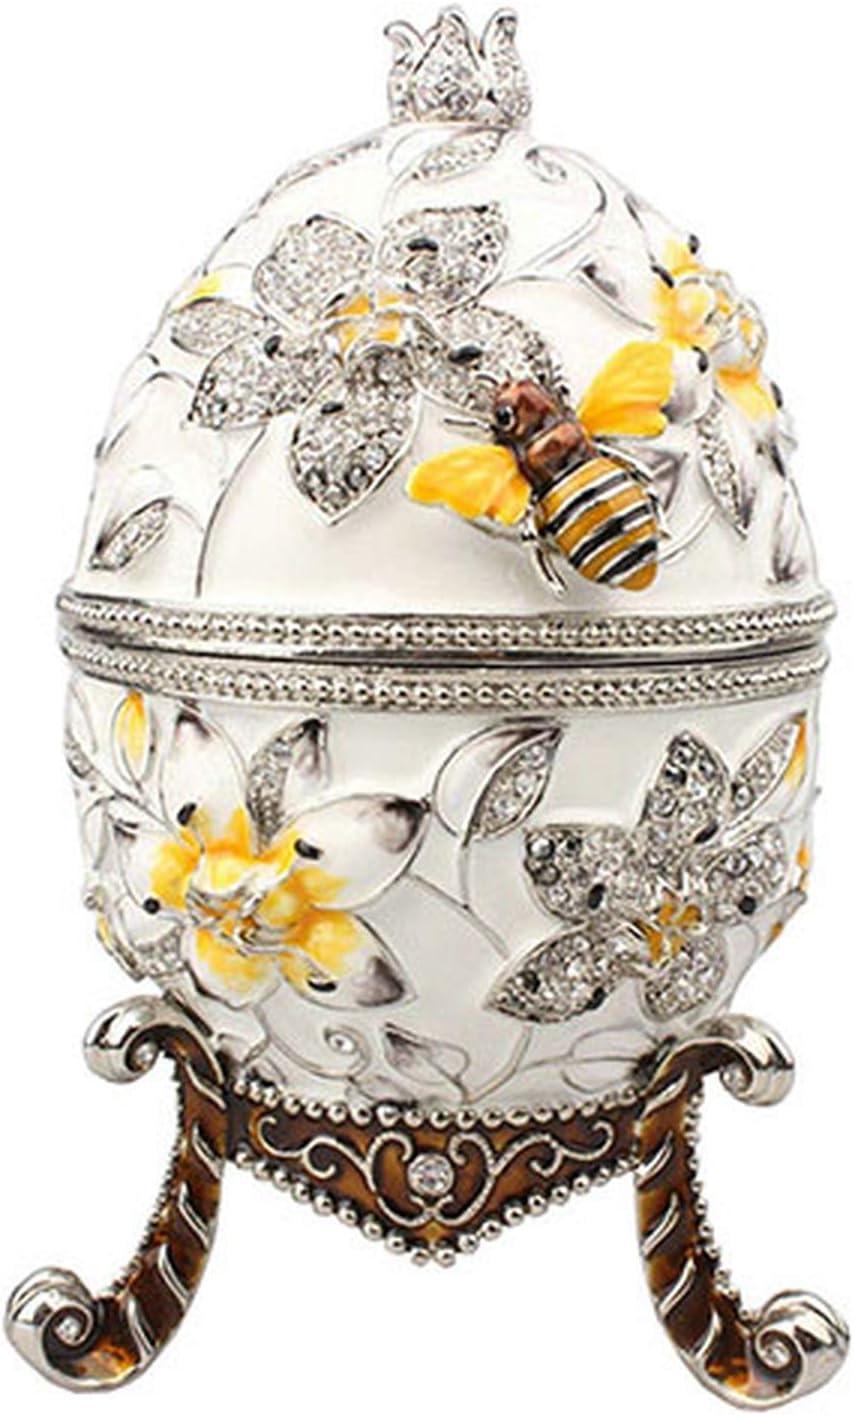 EyeMsea Big Faberge - Joyero con Forma de Huevo con Abeja, Caja de Metal Rusa para Anillos, Blanco, Size